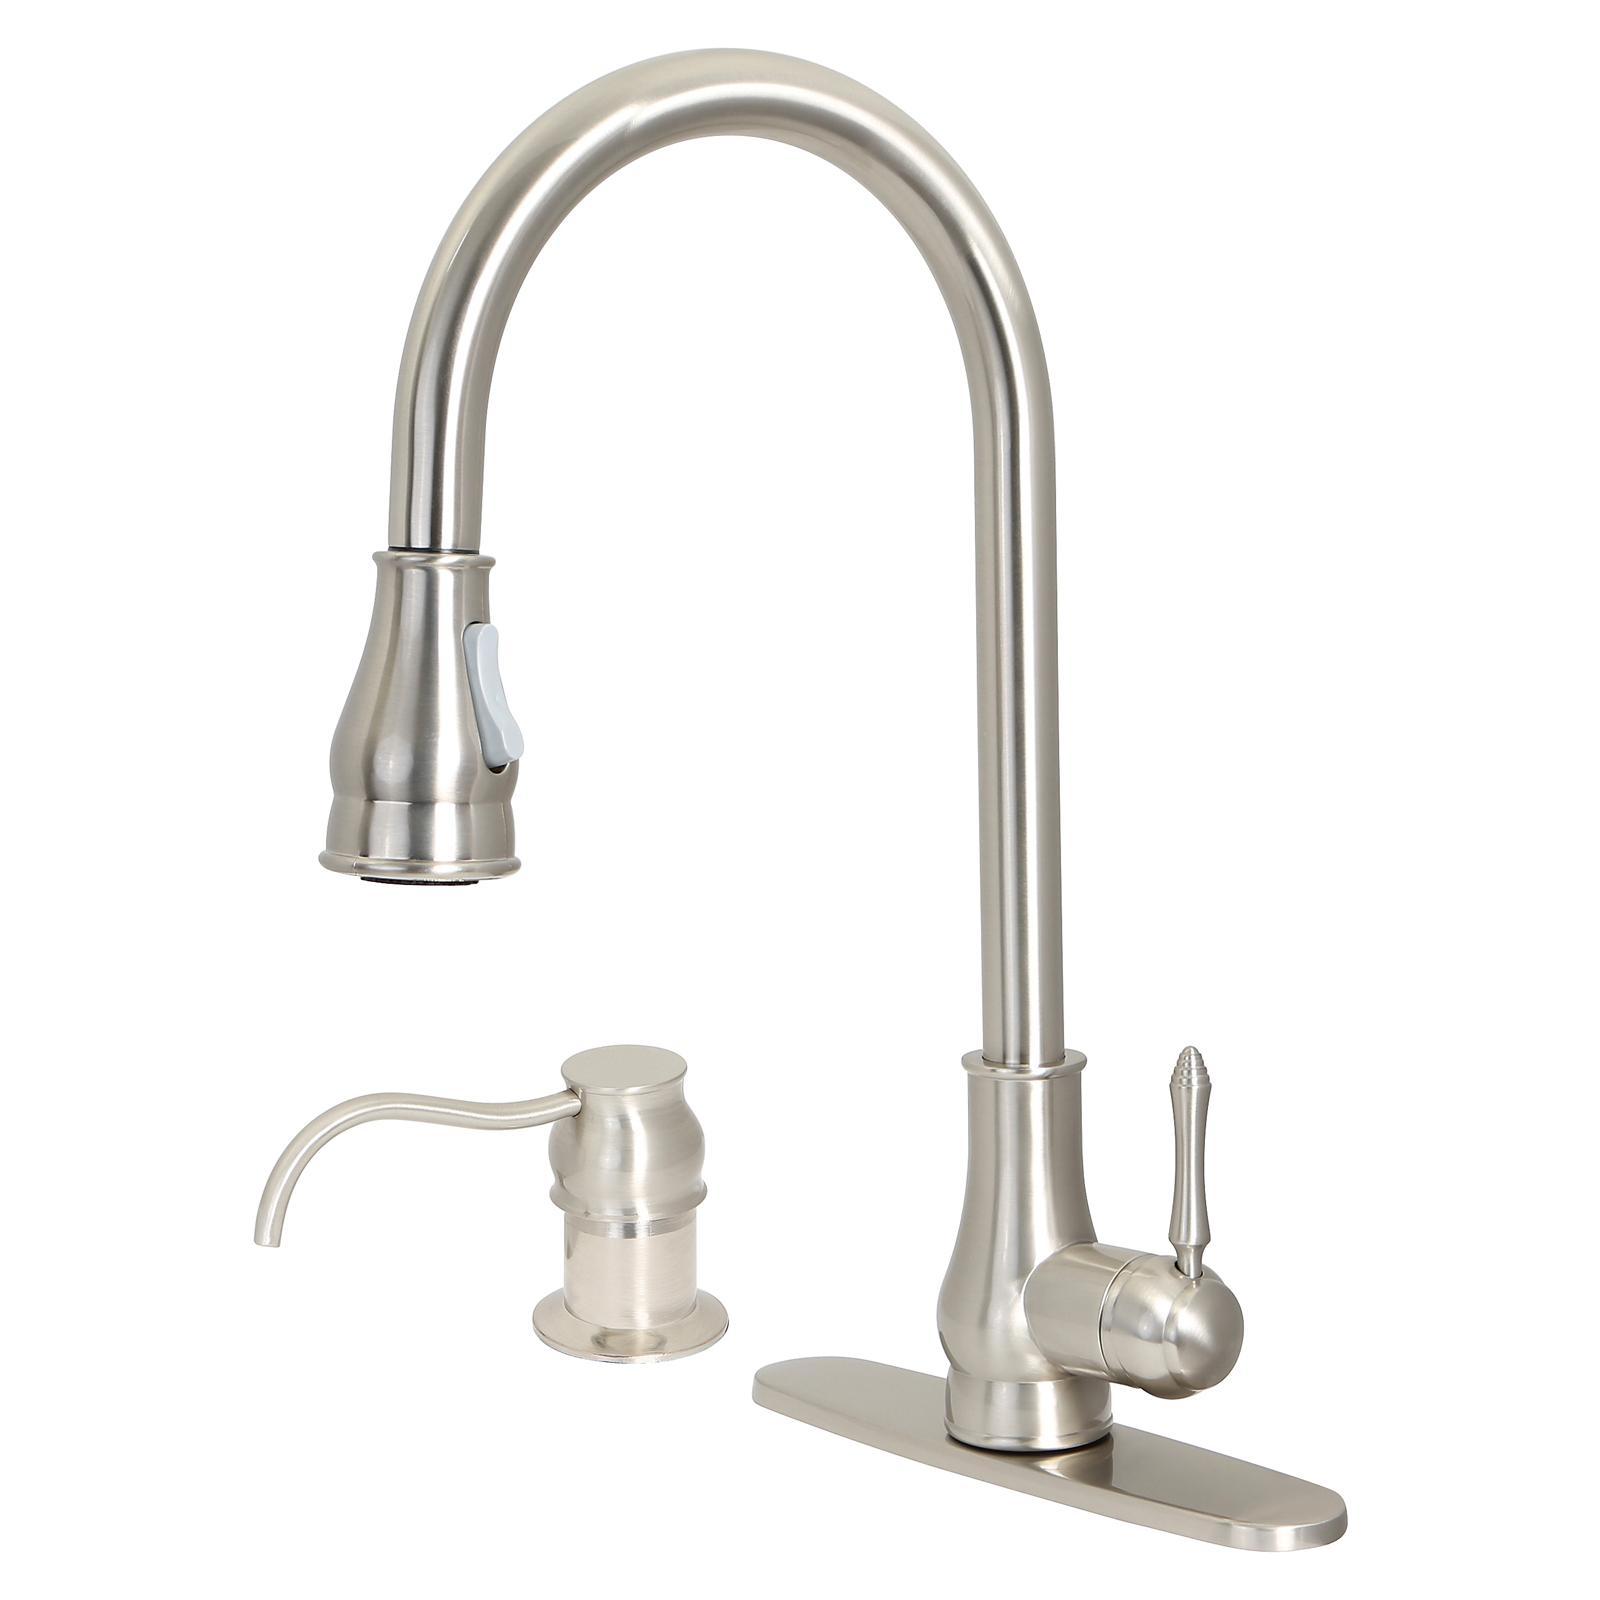 "18"" Pull Down Kitchen Sink Faucet W/ Soap Dispenser"